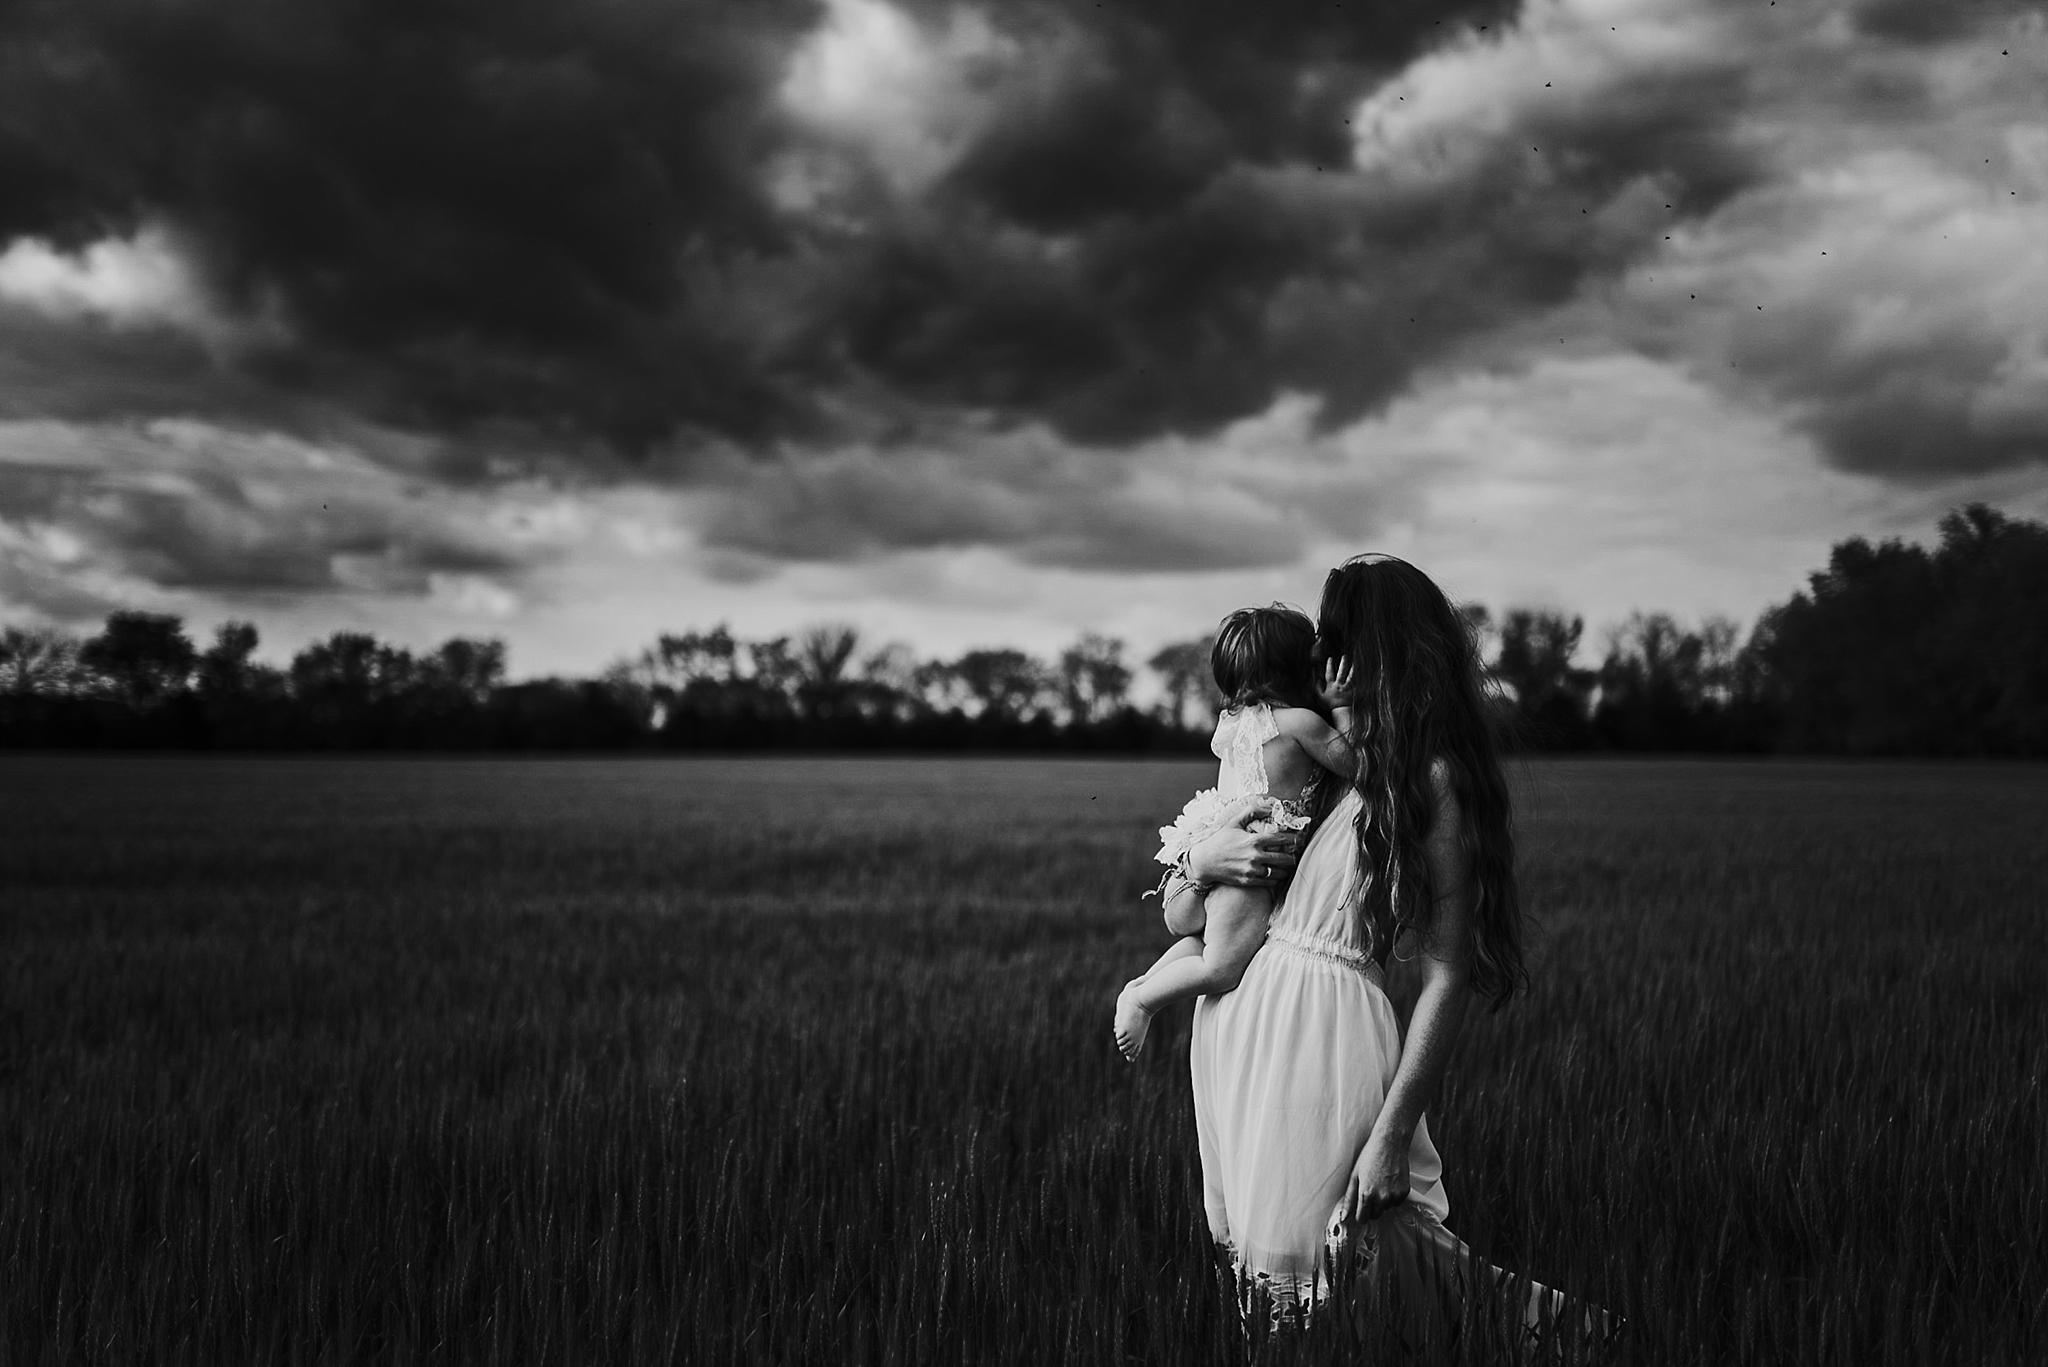 twyla jones photography - mother daughter - field and forest-4373_treasure coast florida.jpg